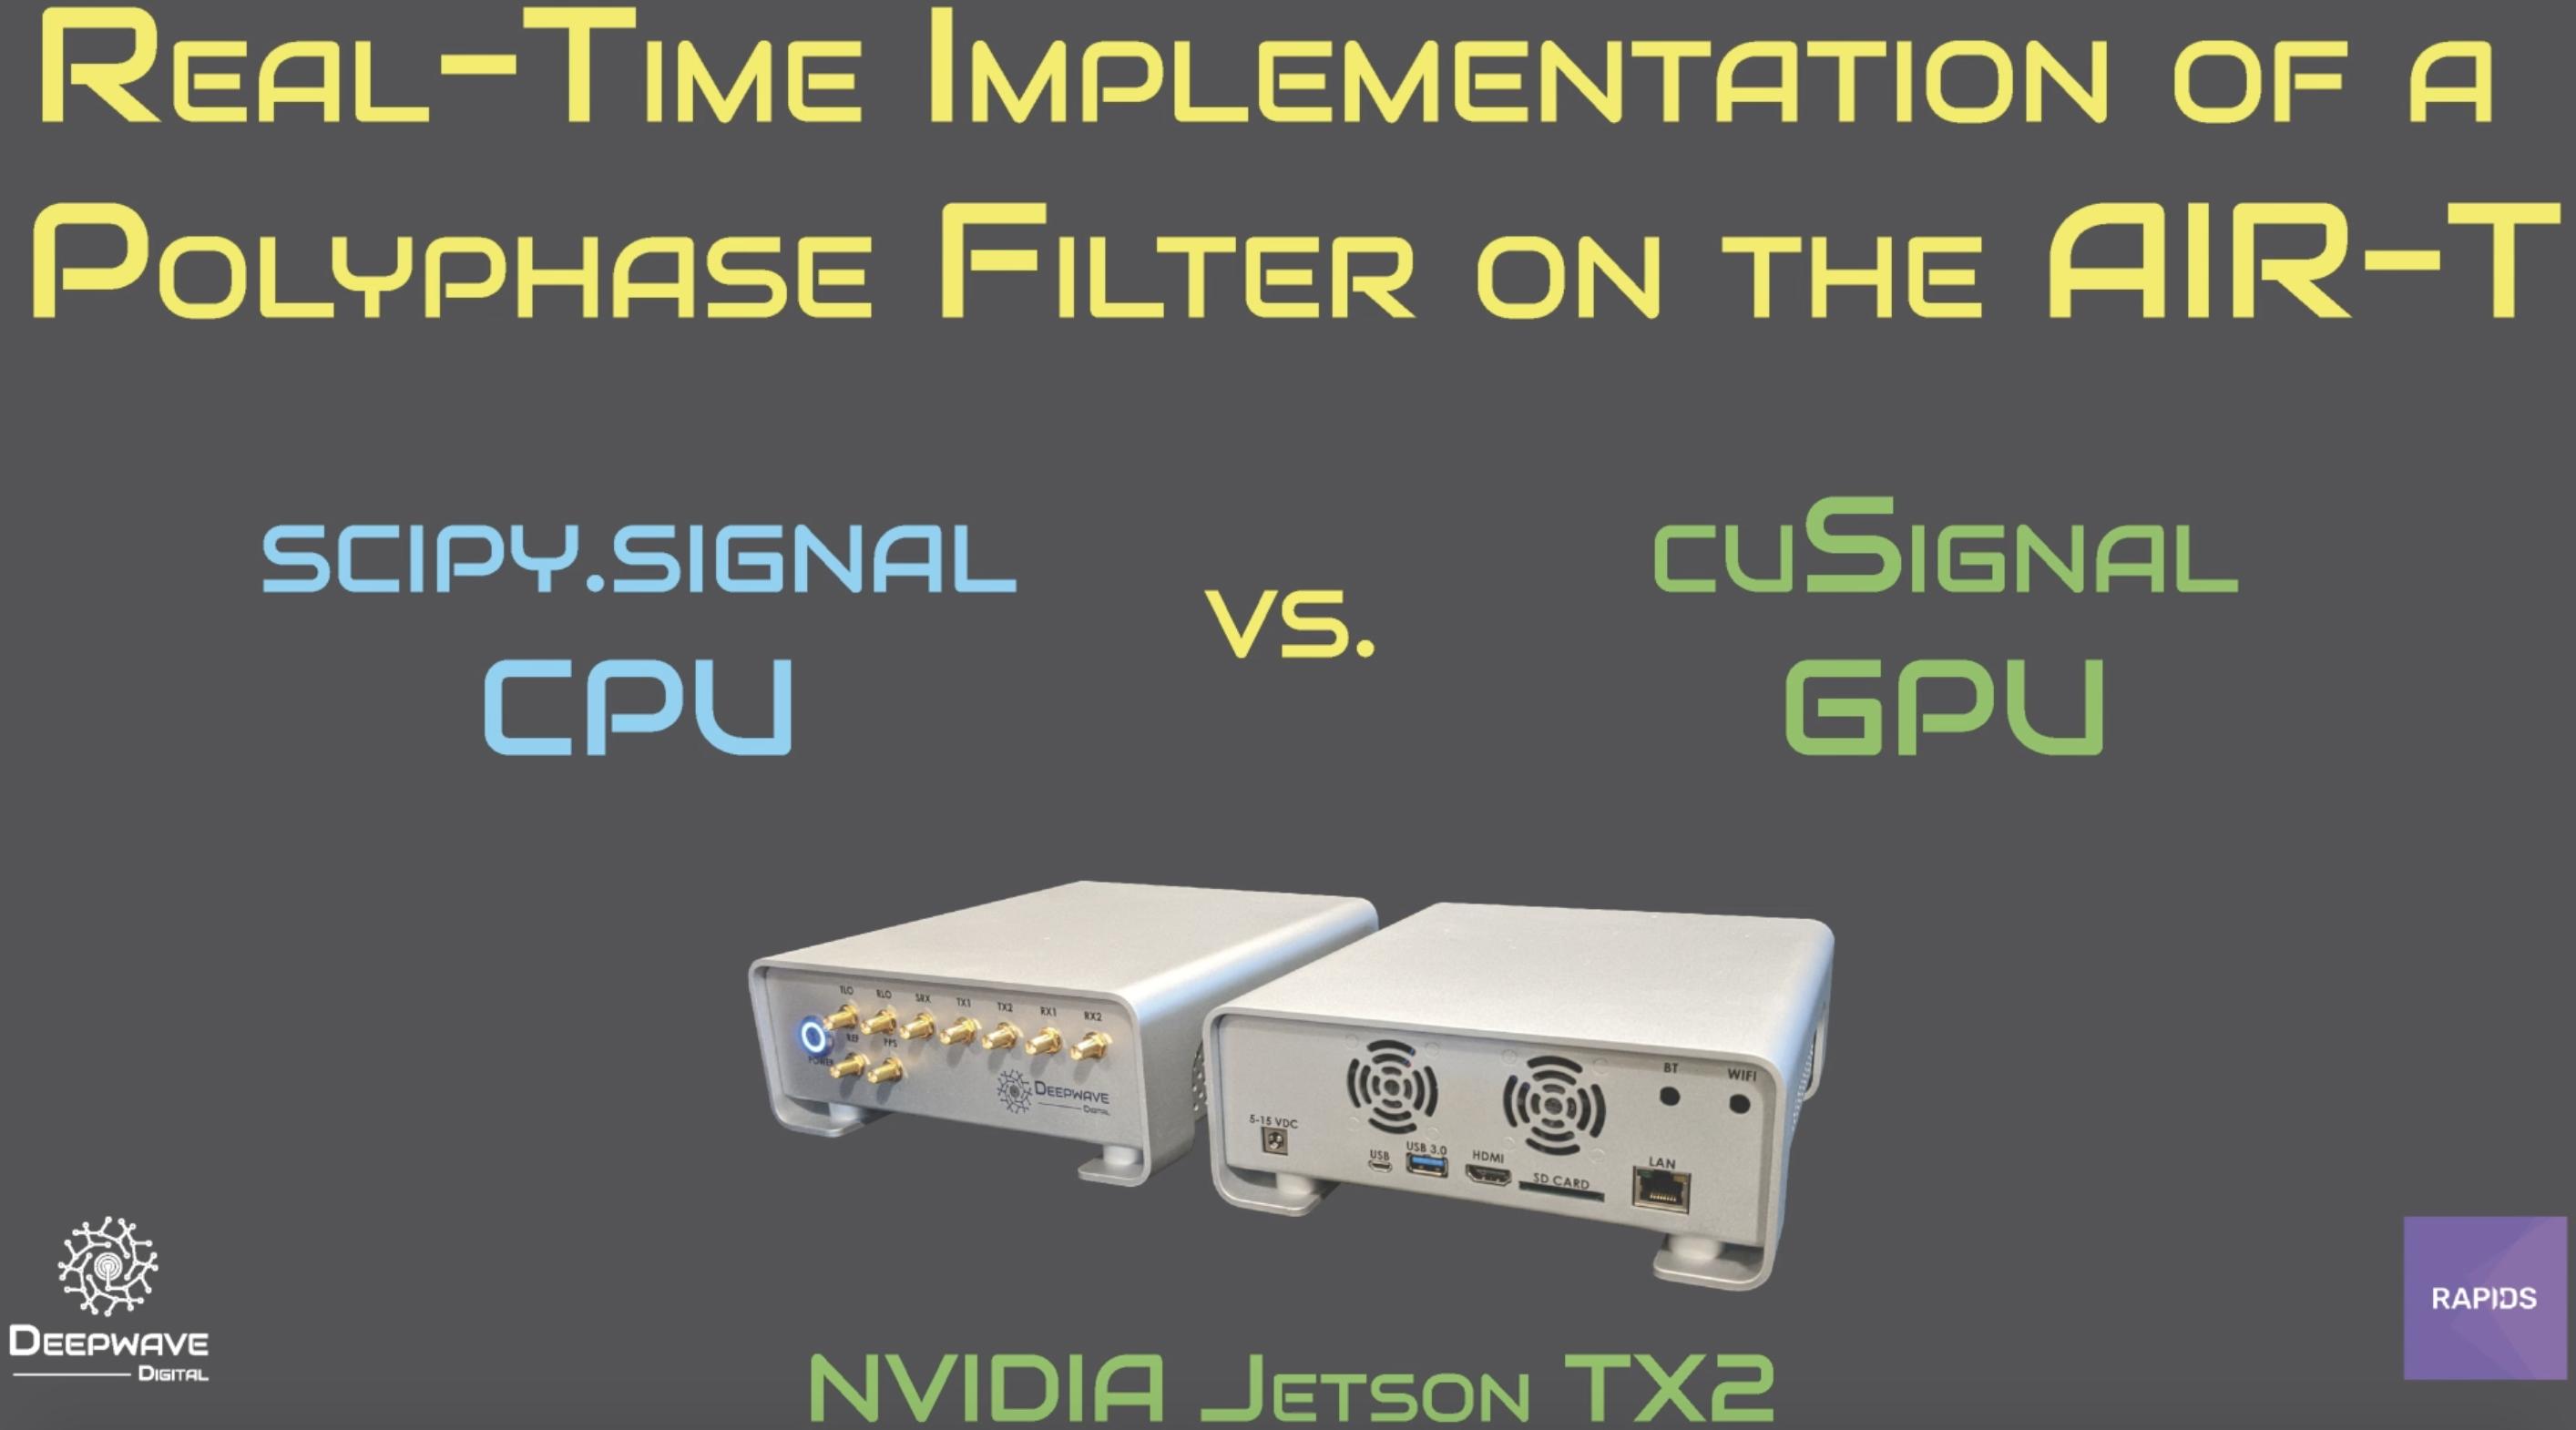 Deepwave and RAPIDS Team Collaborate on cuSignal 0.13